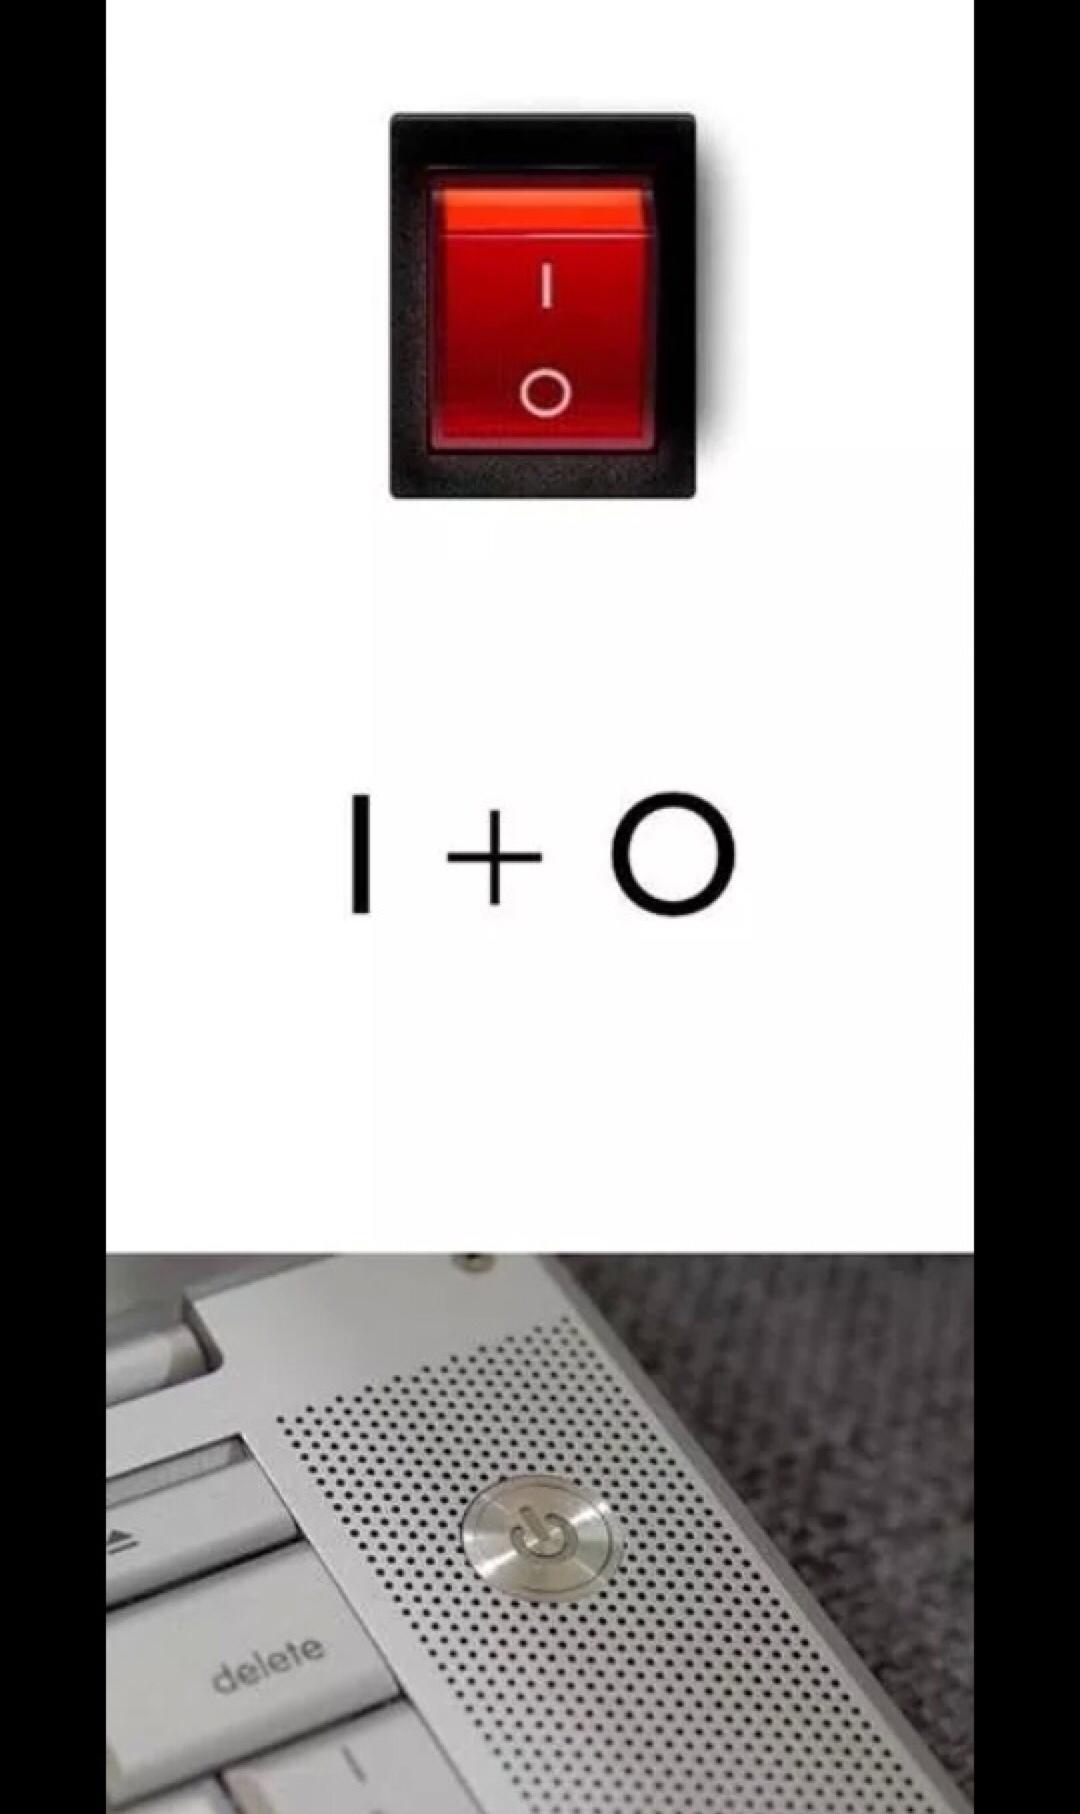 tecnologia - meme